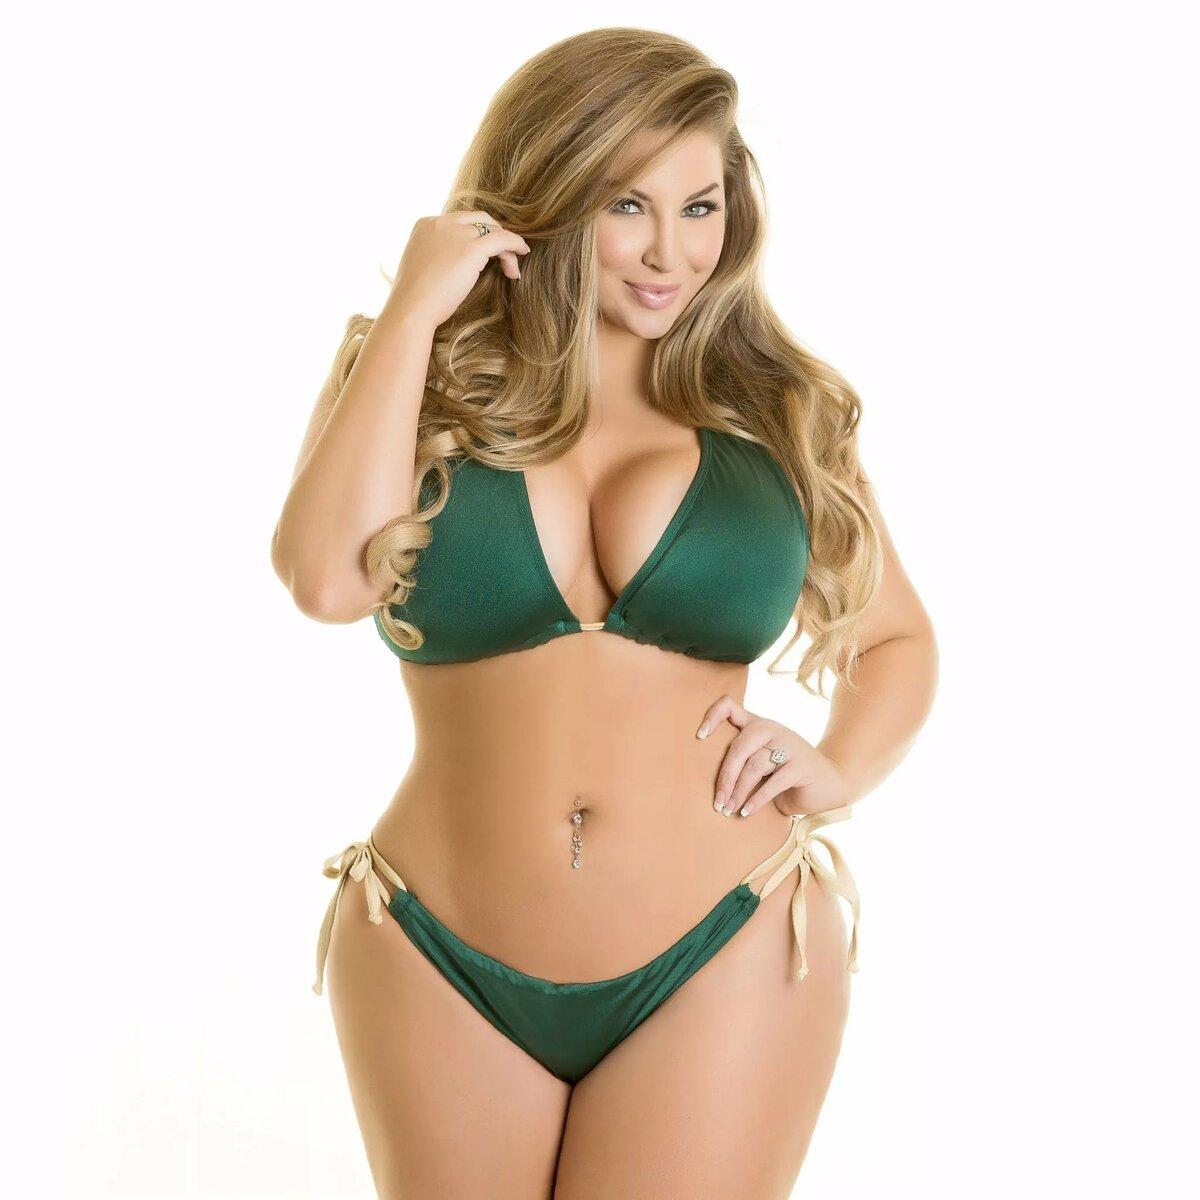 Plus size curvy girls bikini, amature uk swinger sex party pictures